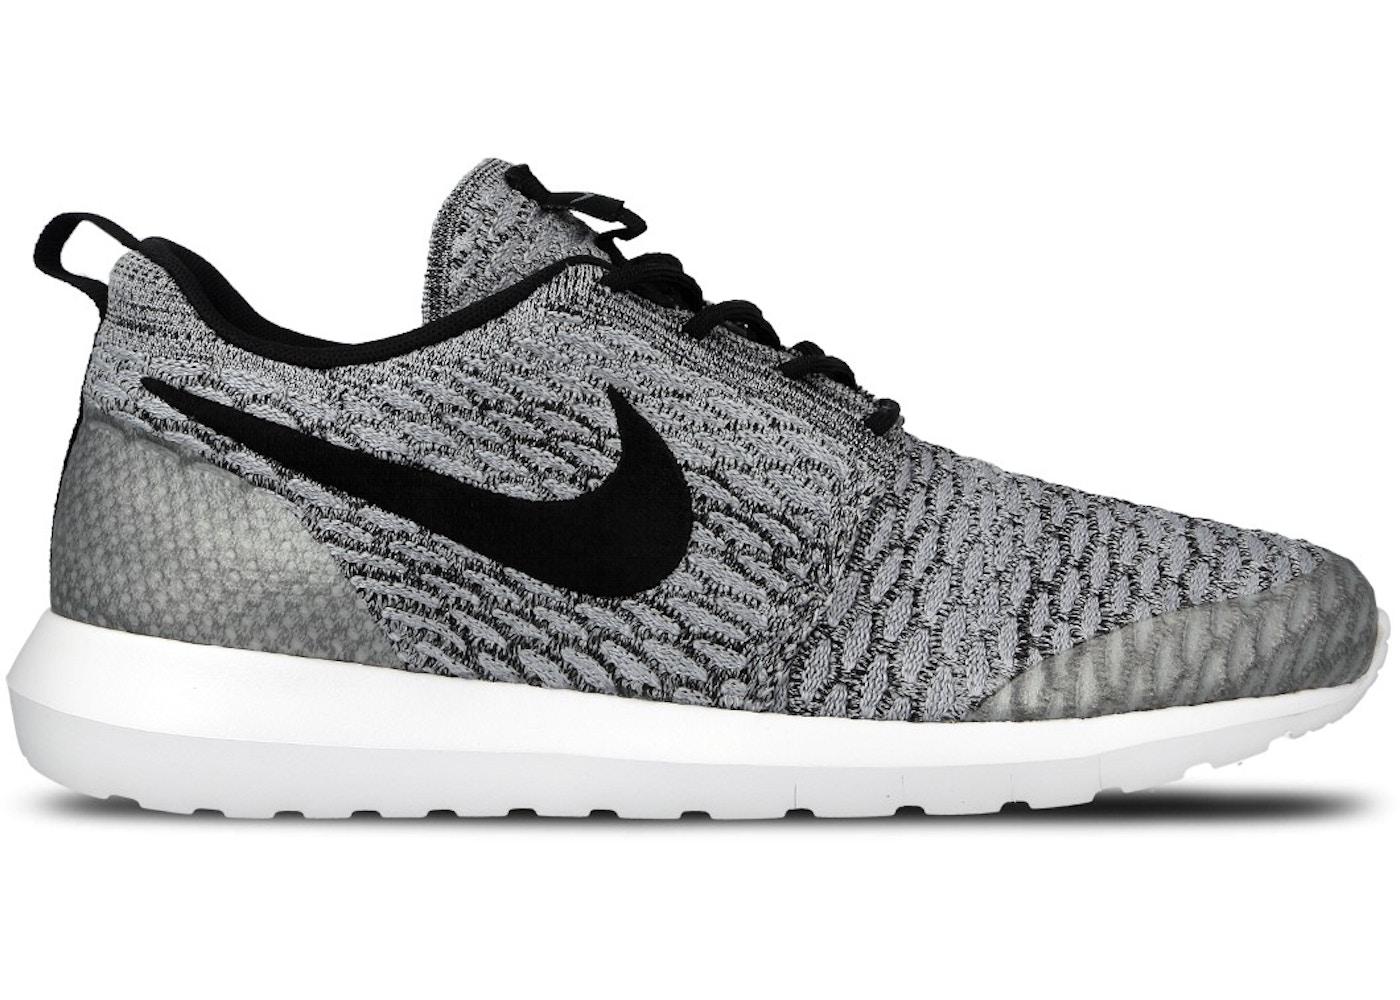 Nike Roshe Run Flyknit NM Wolf Grey